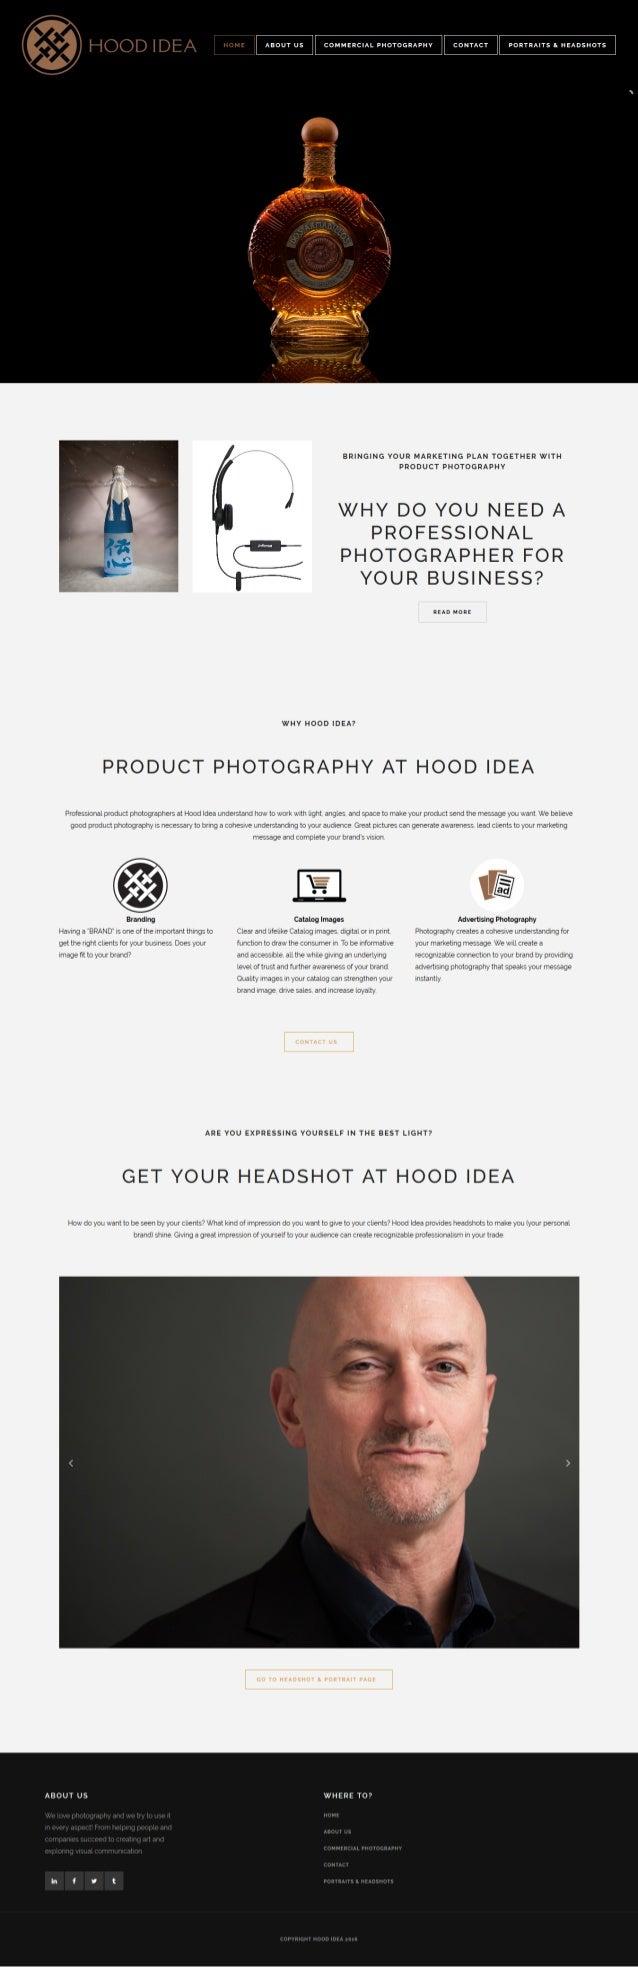 Best Professional Headshot Photographer Portland